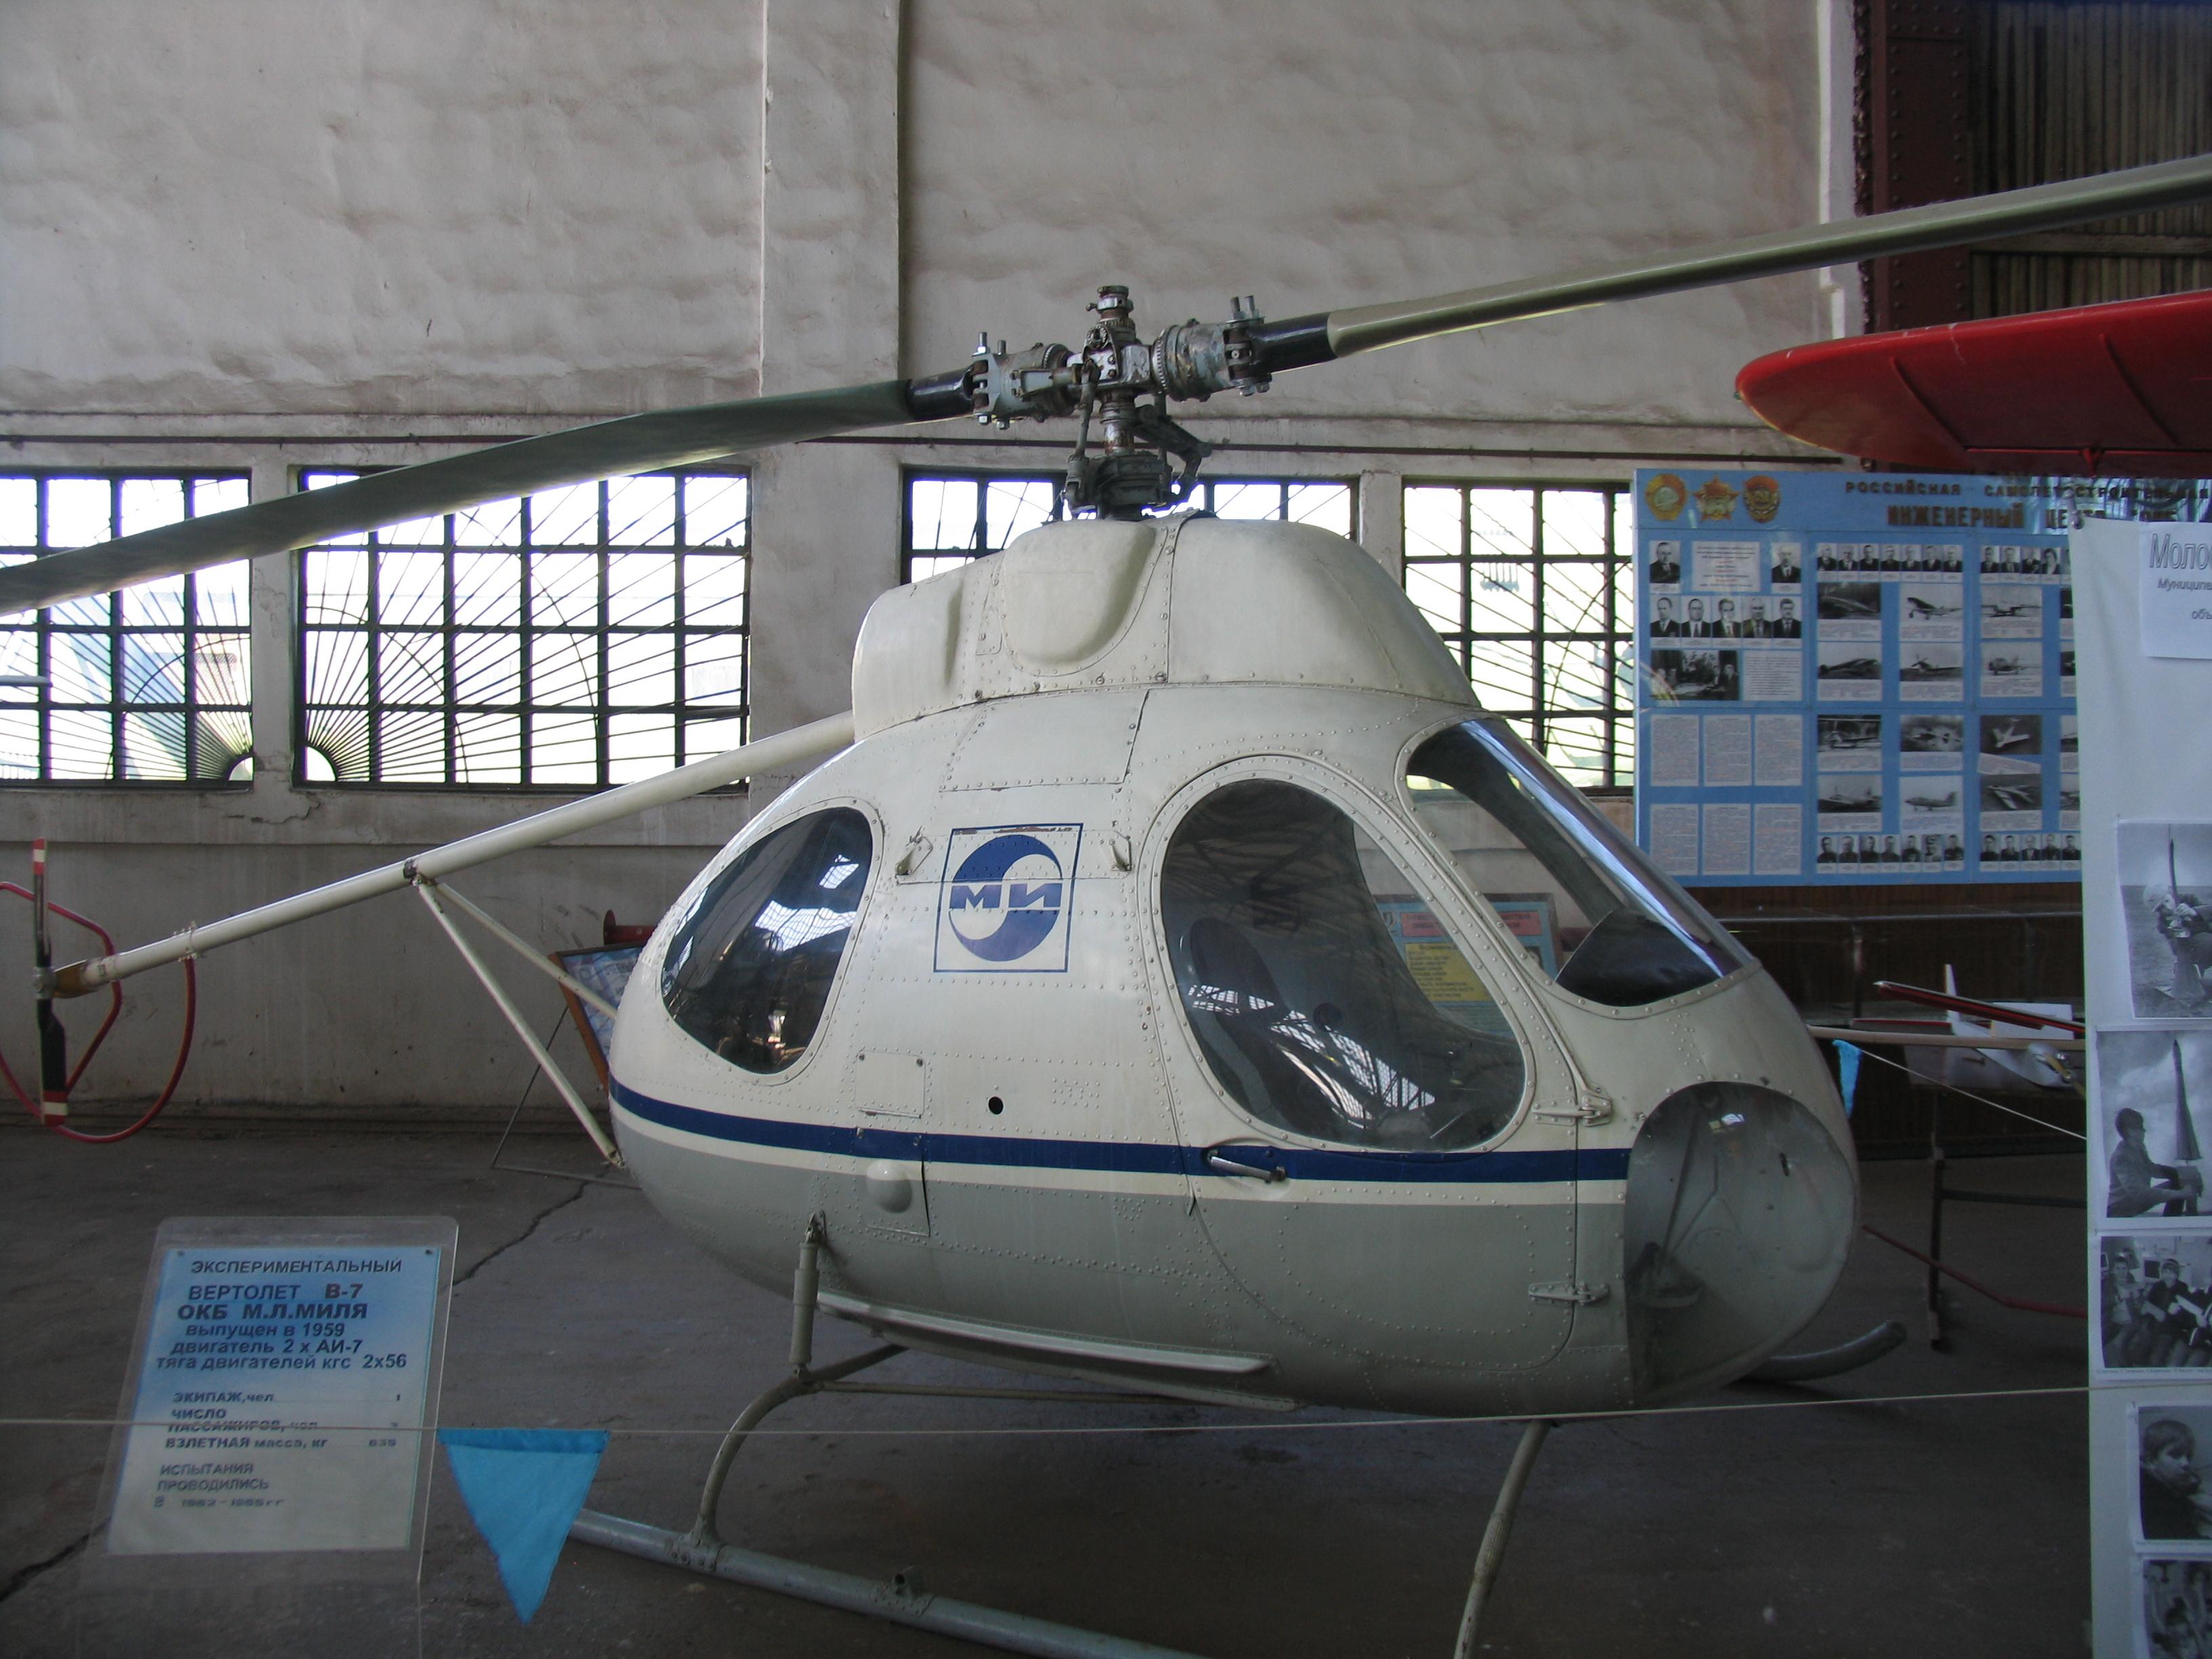 http://upload.wikimedia.org/wikipedia/commons/f/f7/Mil_V-7_VVS_museum.jpg